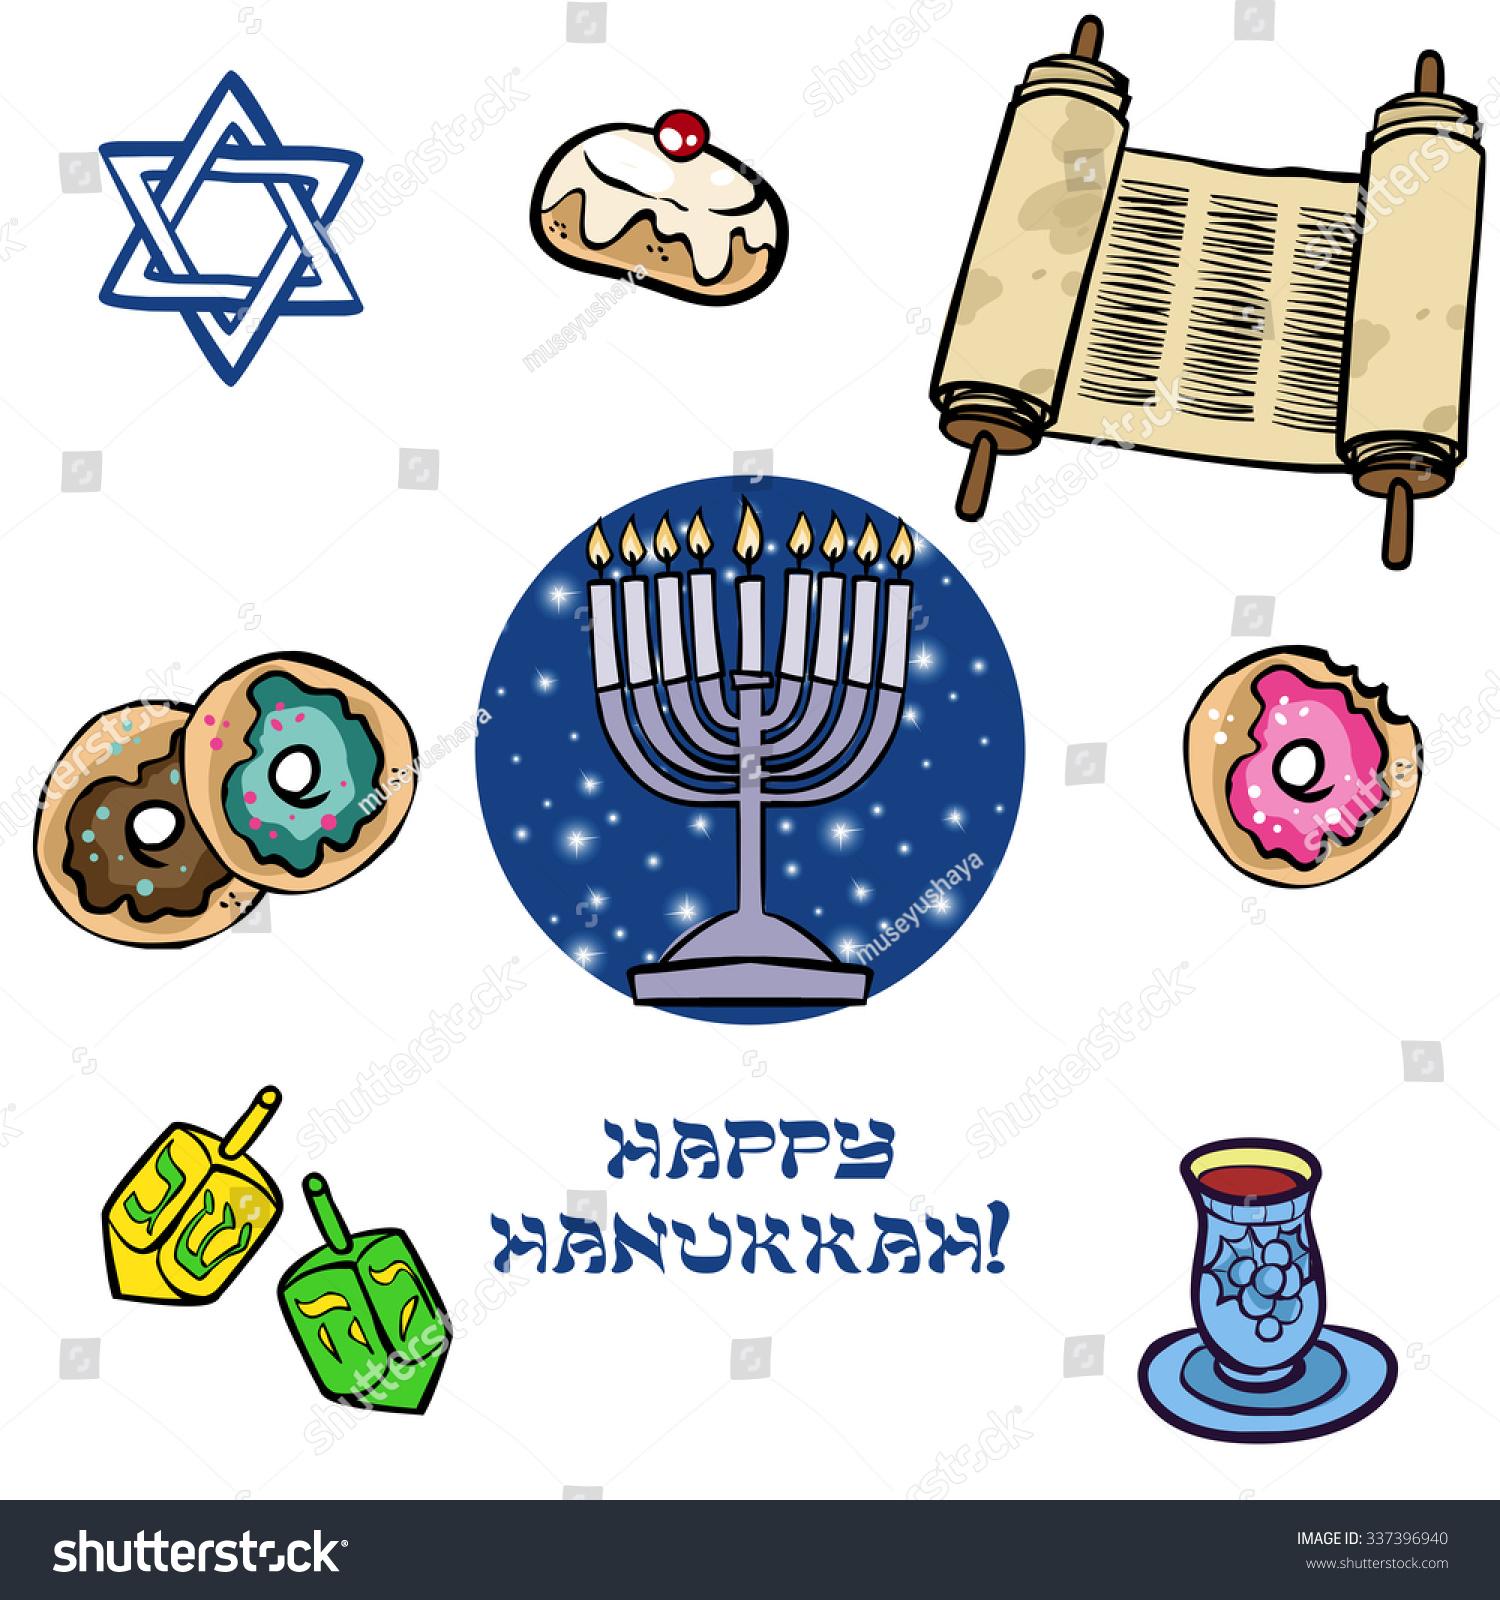 Hanukkah Traditional Jewish Holiday Doodle Symbols Stock Vector